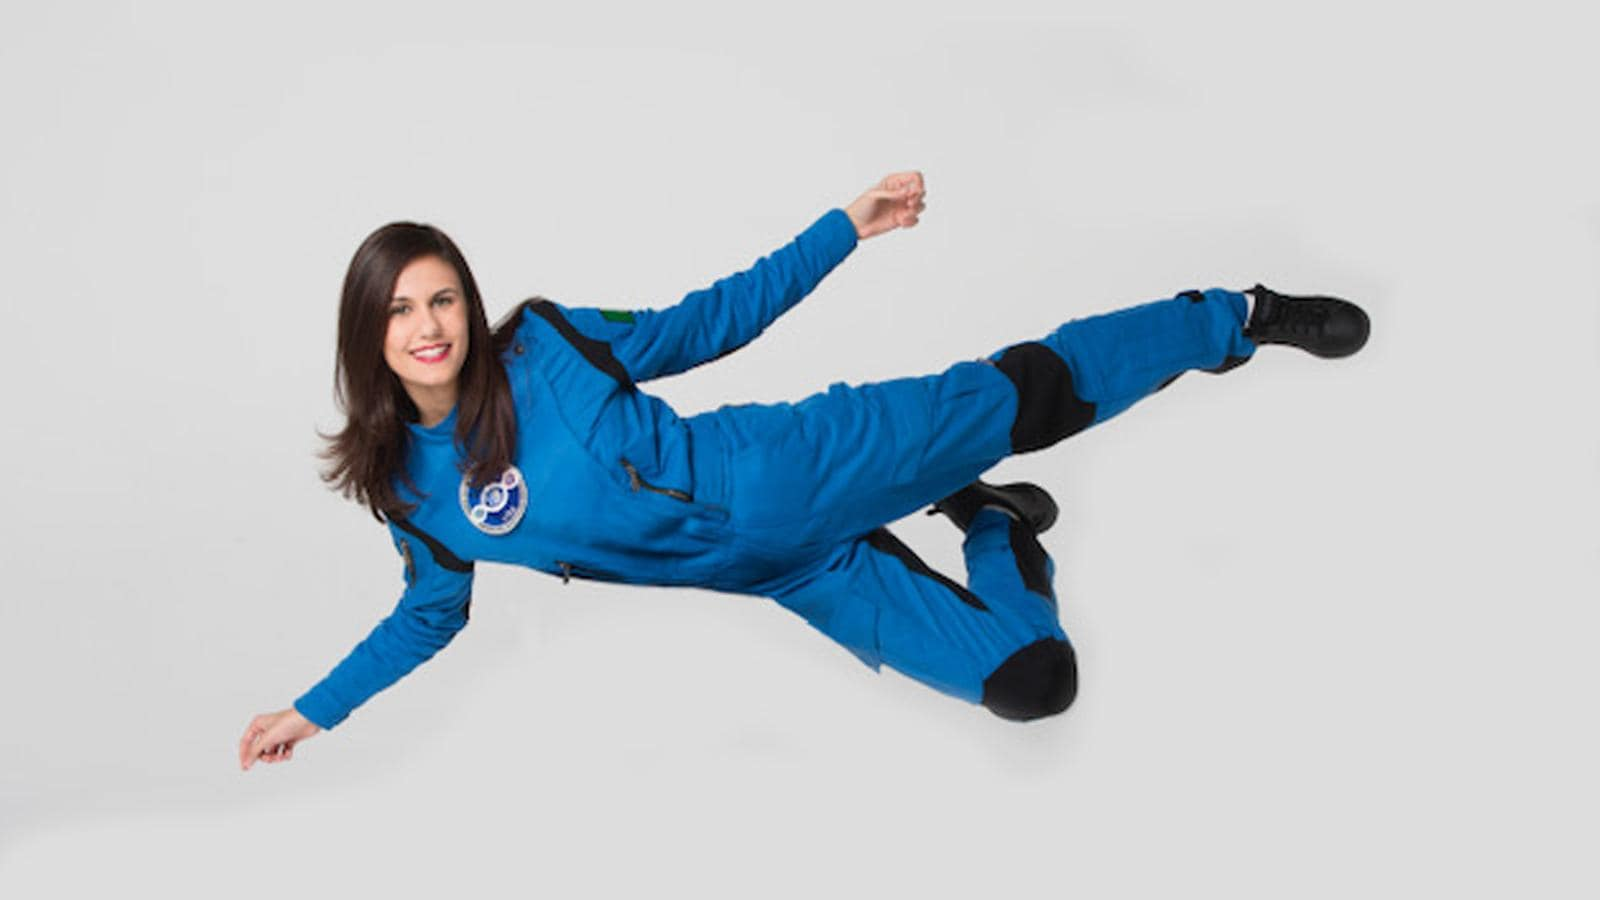 Space To Ground Guida Per Viaggiatori Galattici Rai Ufficio Stampa